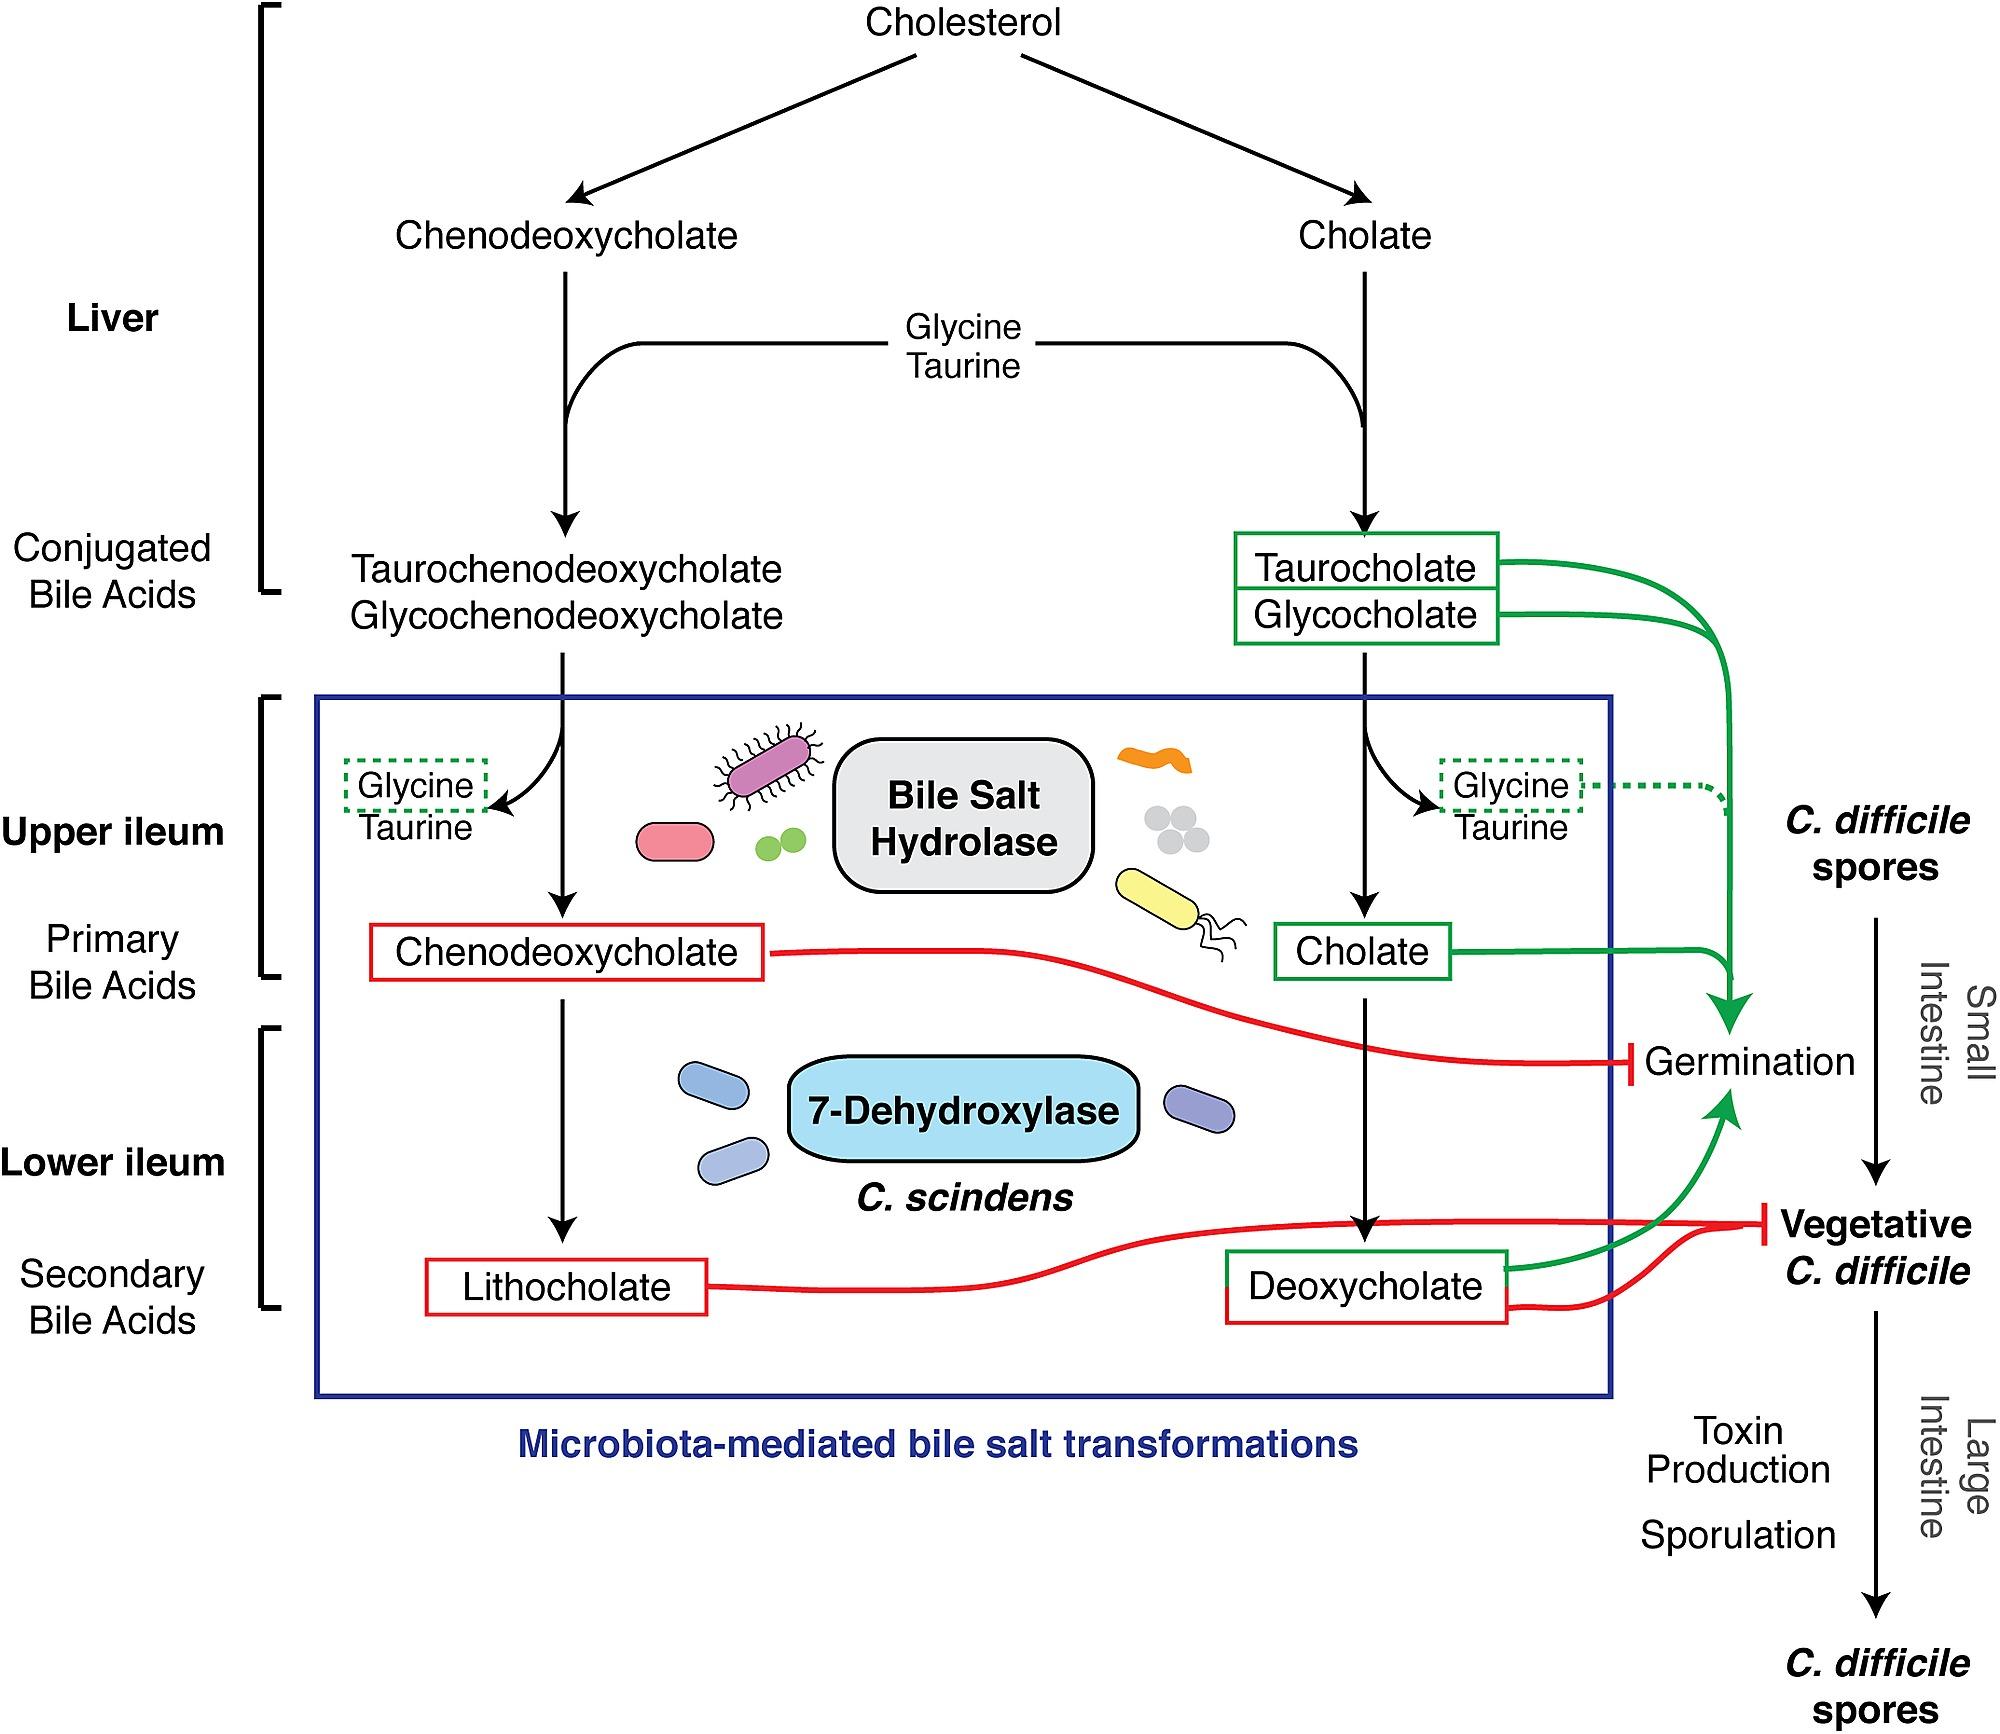 Effect Of Bile Acid Metabolism On The Developmental Life Cycle Of C